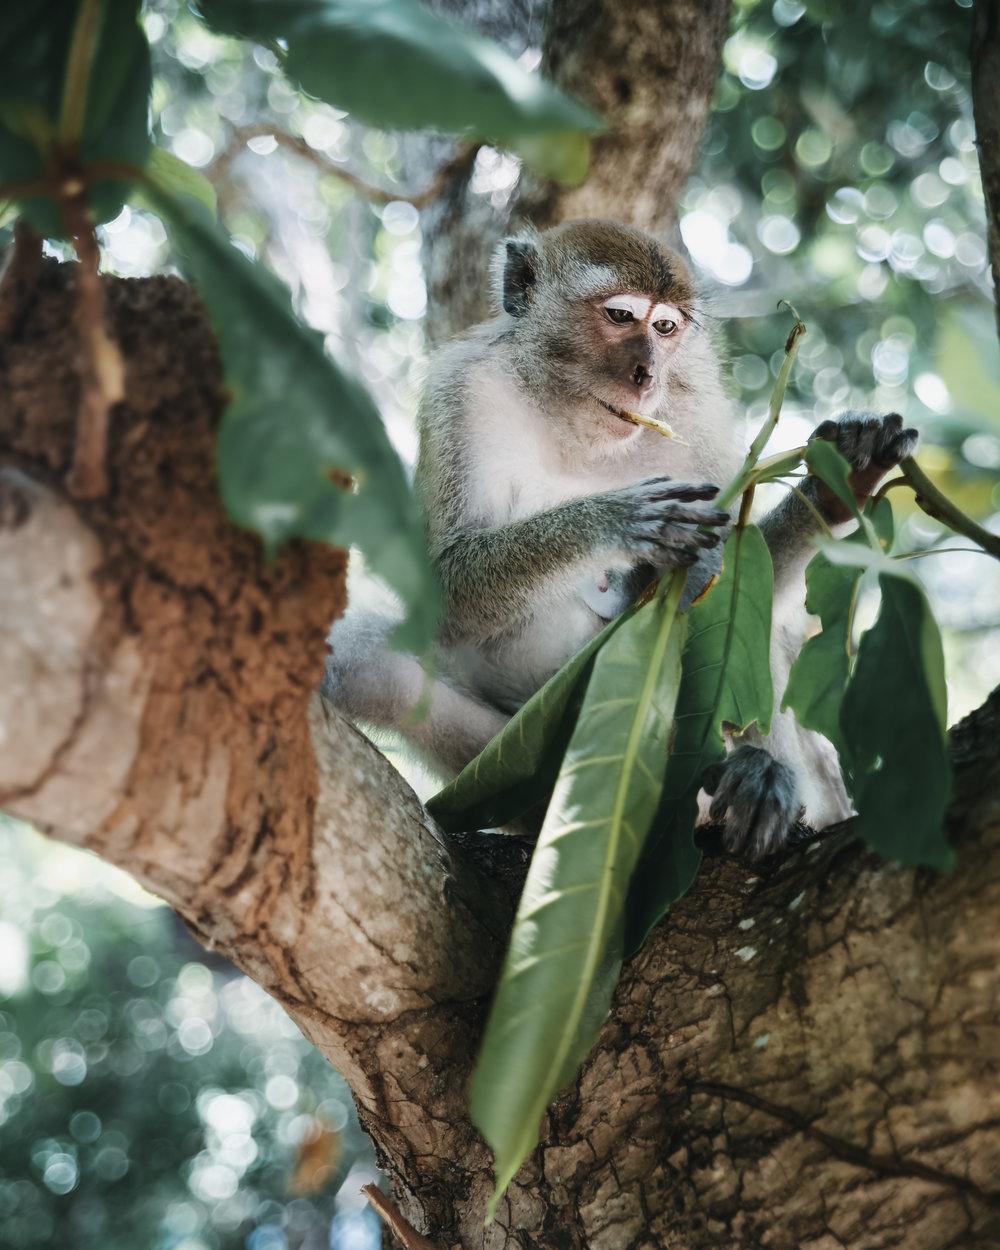 Wildlife monkey bali BY MADS NORDSVEEN